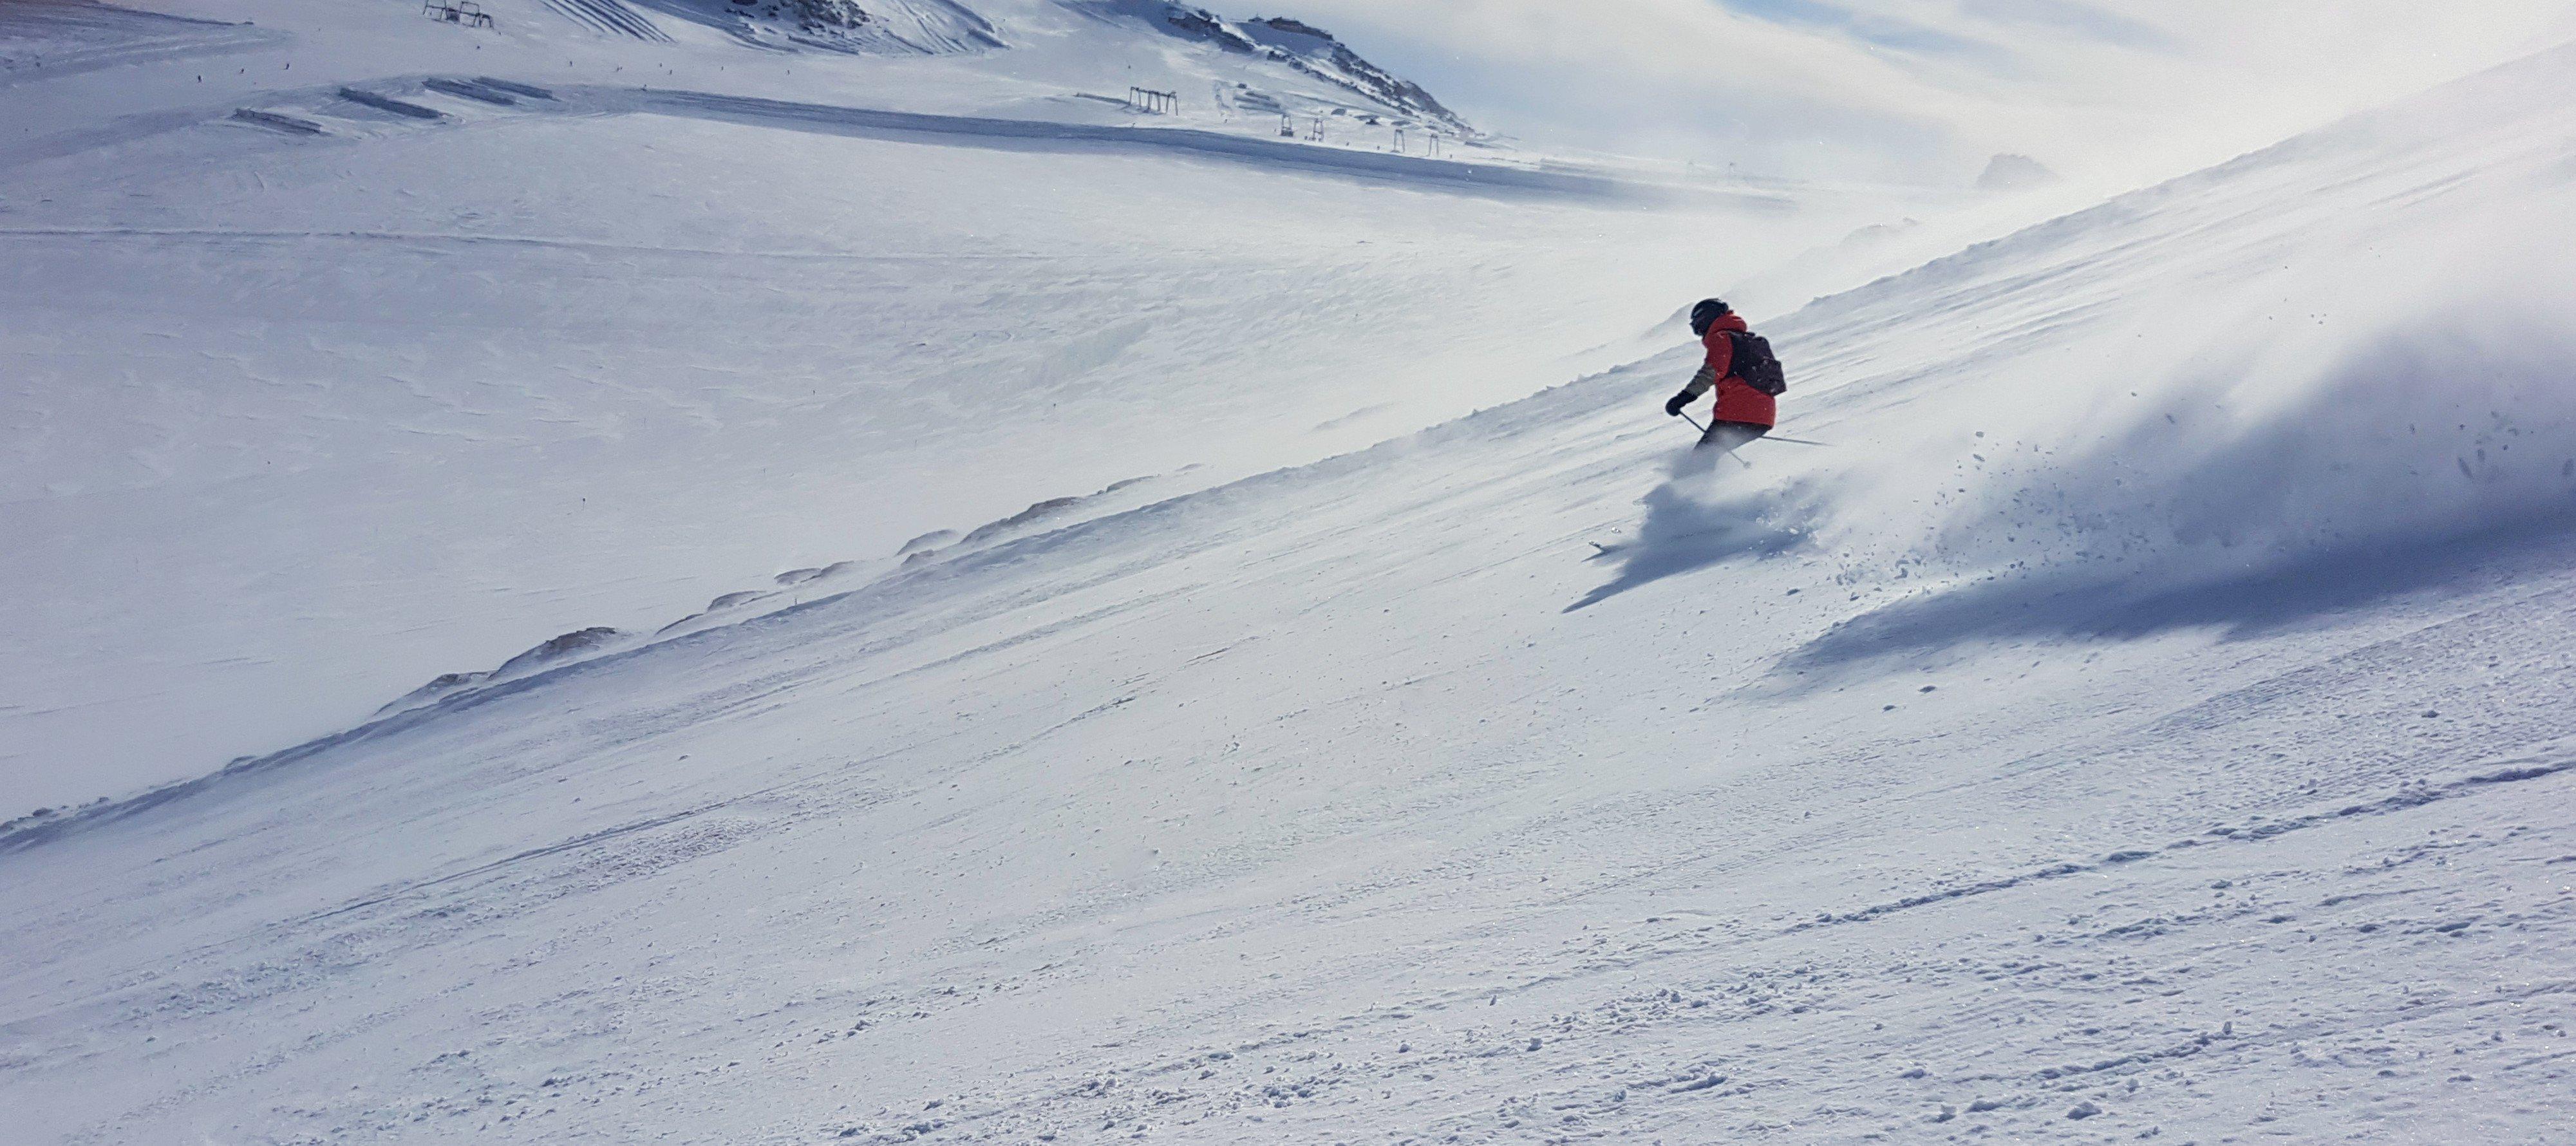 Snowboarding In The Austrian Alps